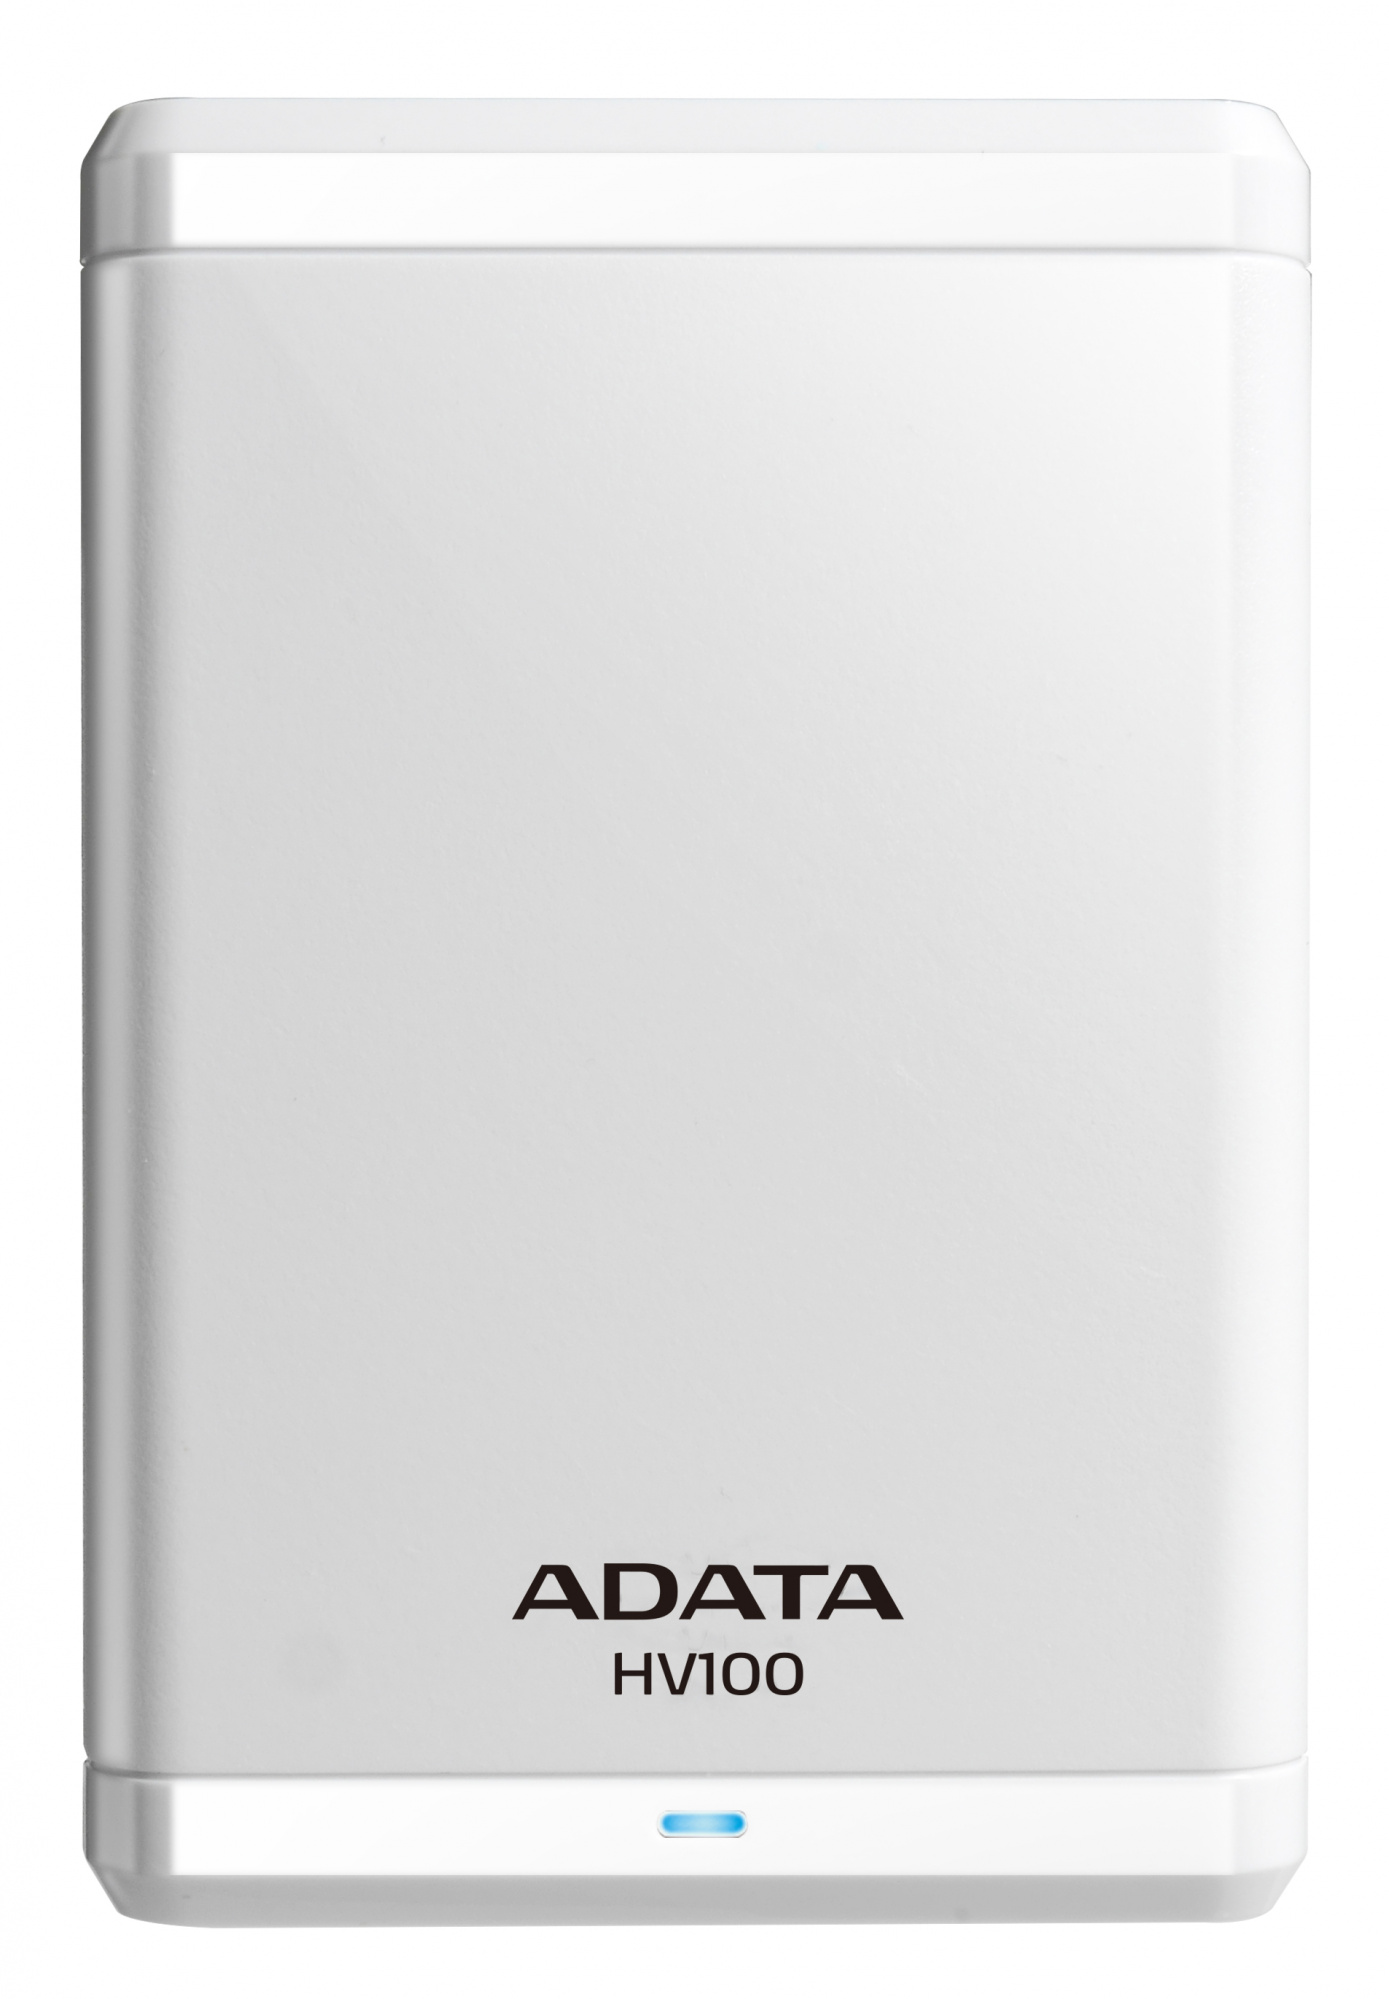 "Adata HV100 2.5"", 1Tb, USB 3.0 (AHV100-1TU3-CWH) - внешний жесткий диск (White)"